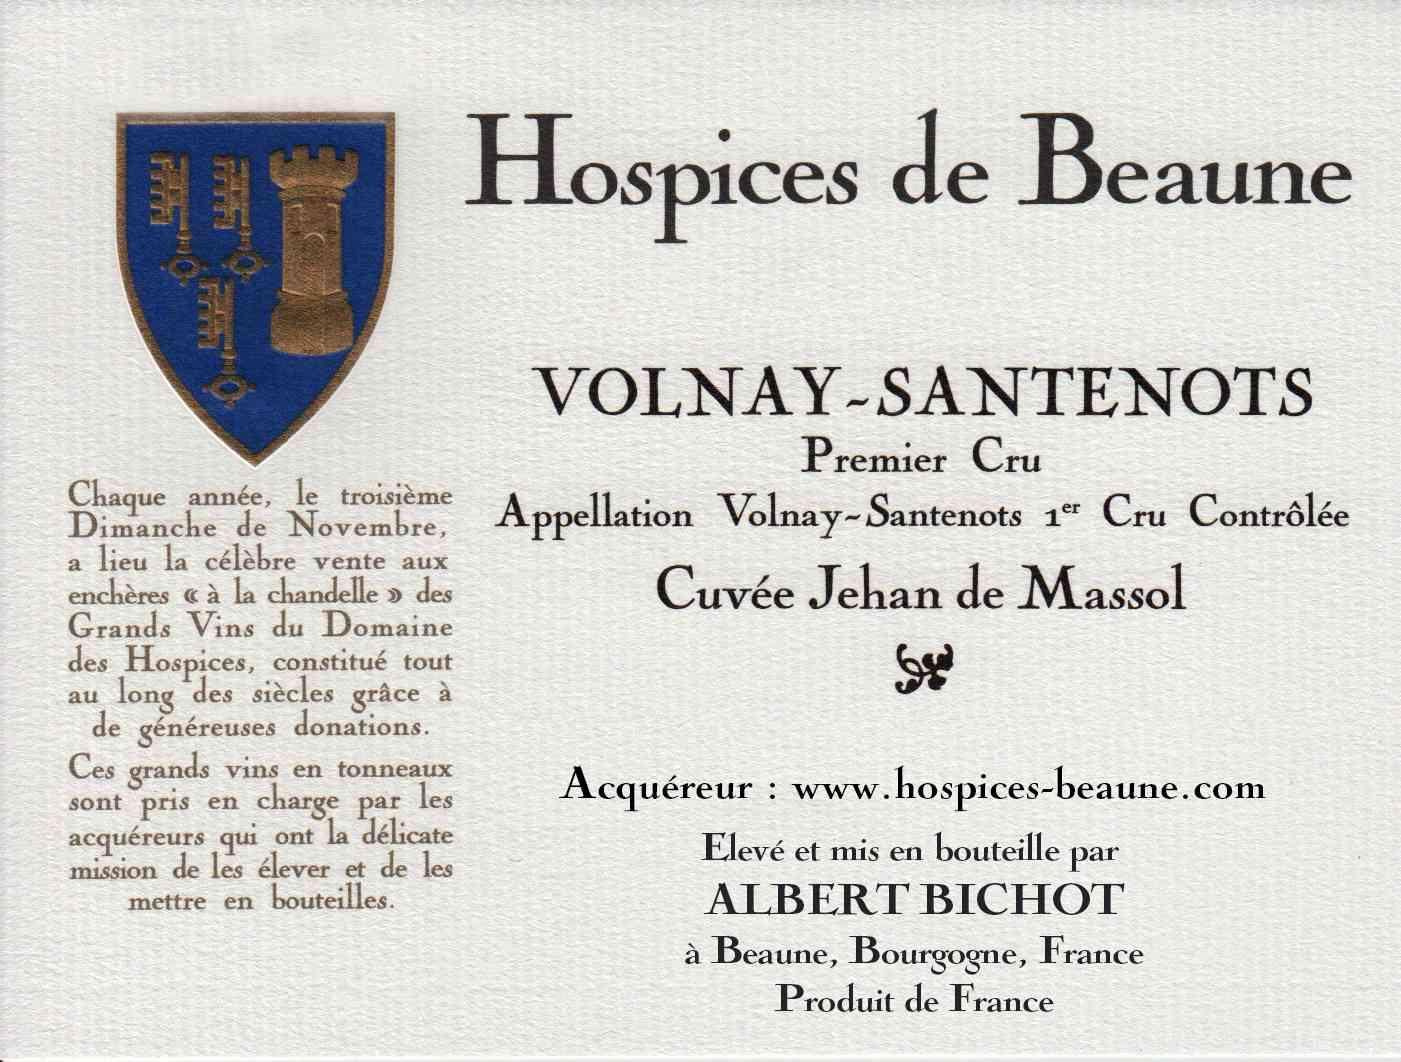 Encheres-auction-HospicesdeBeaune-AlbertBichot-VolnaySantenots-PremierCru-Cuvee-JehandeMassol